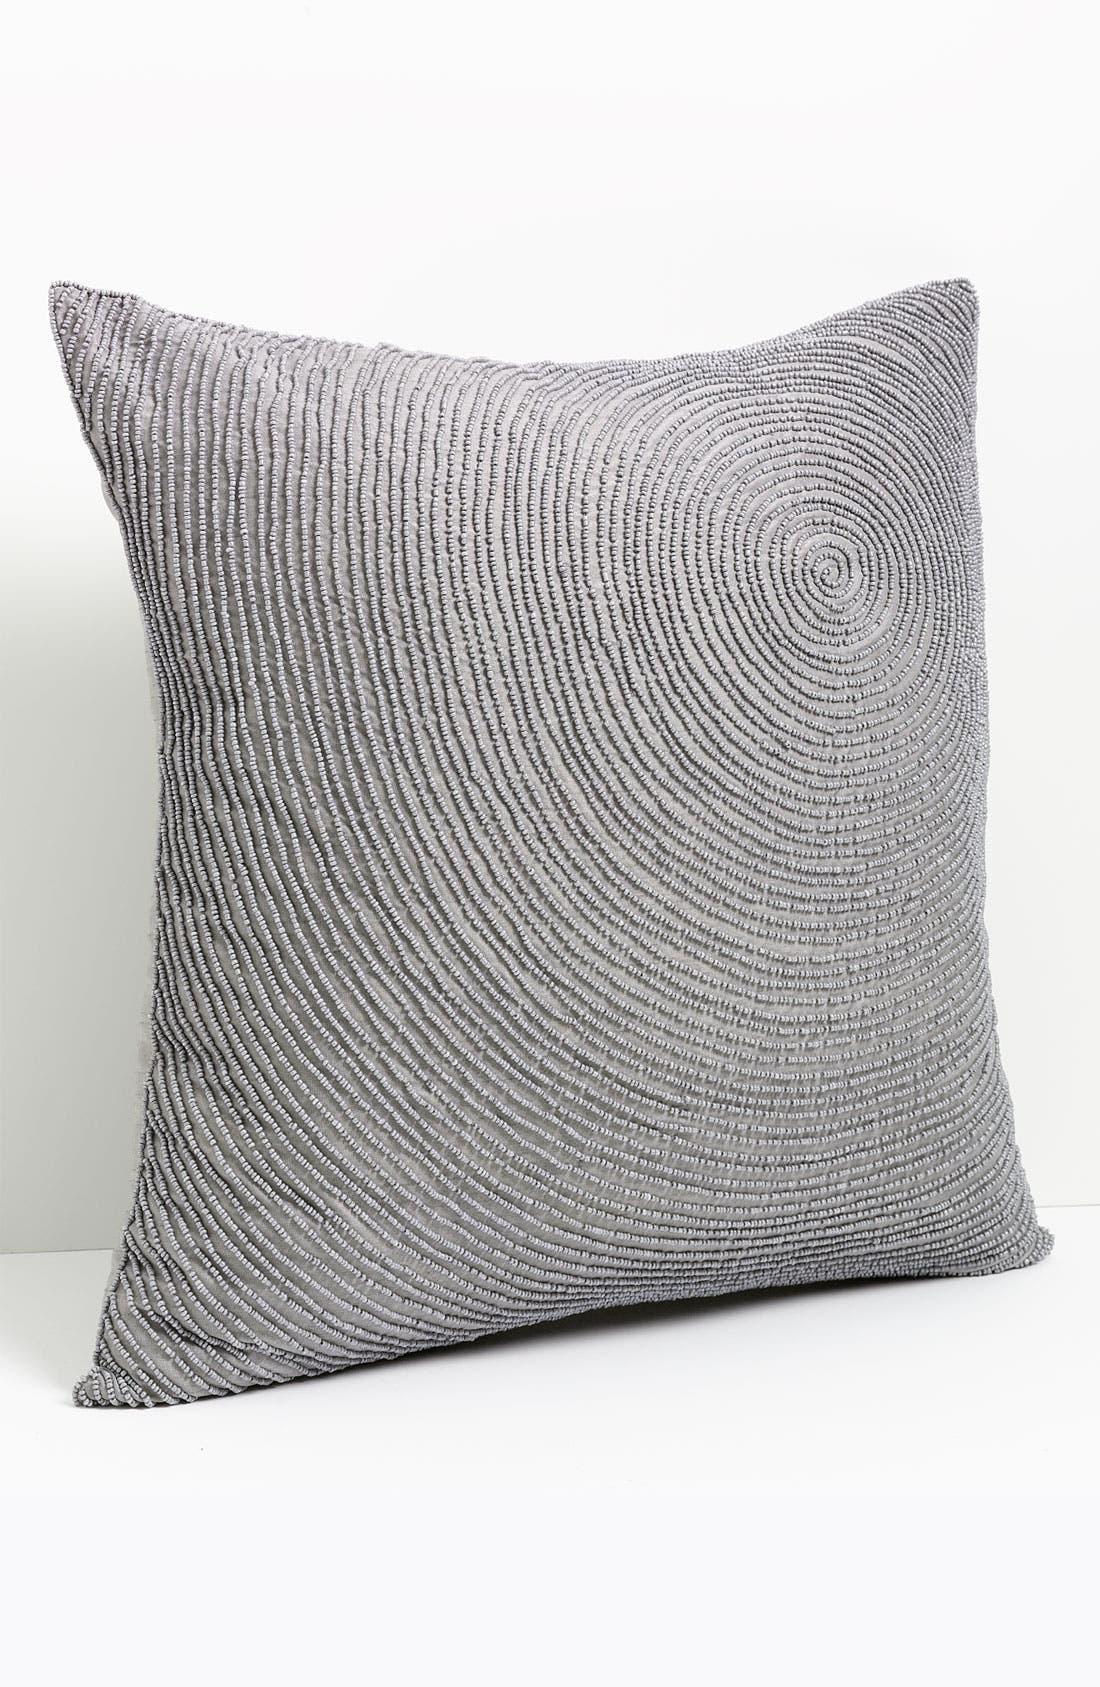 Main Image - Nordstrom at Home Circle Beaded Pillow